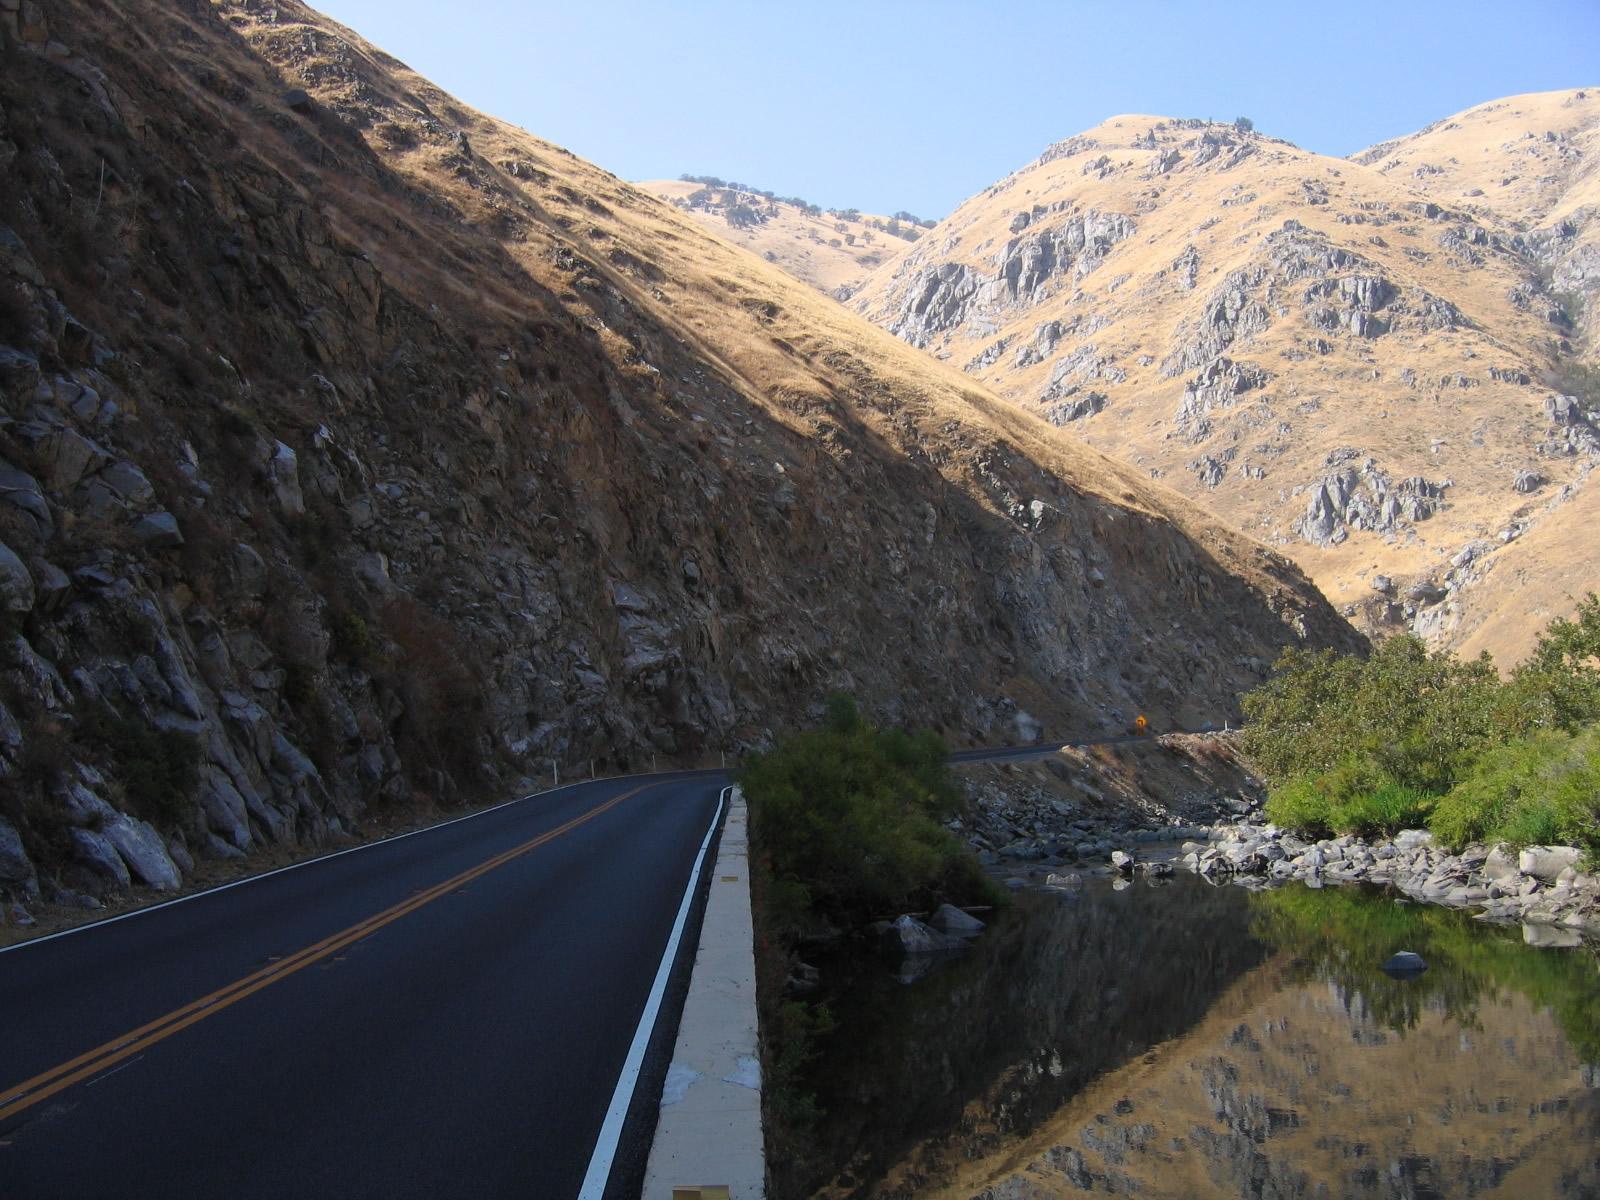 California @ AARoads - California 178 West - Kern River Canyon